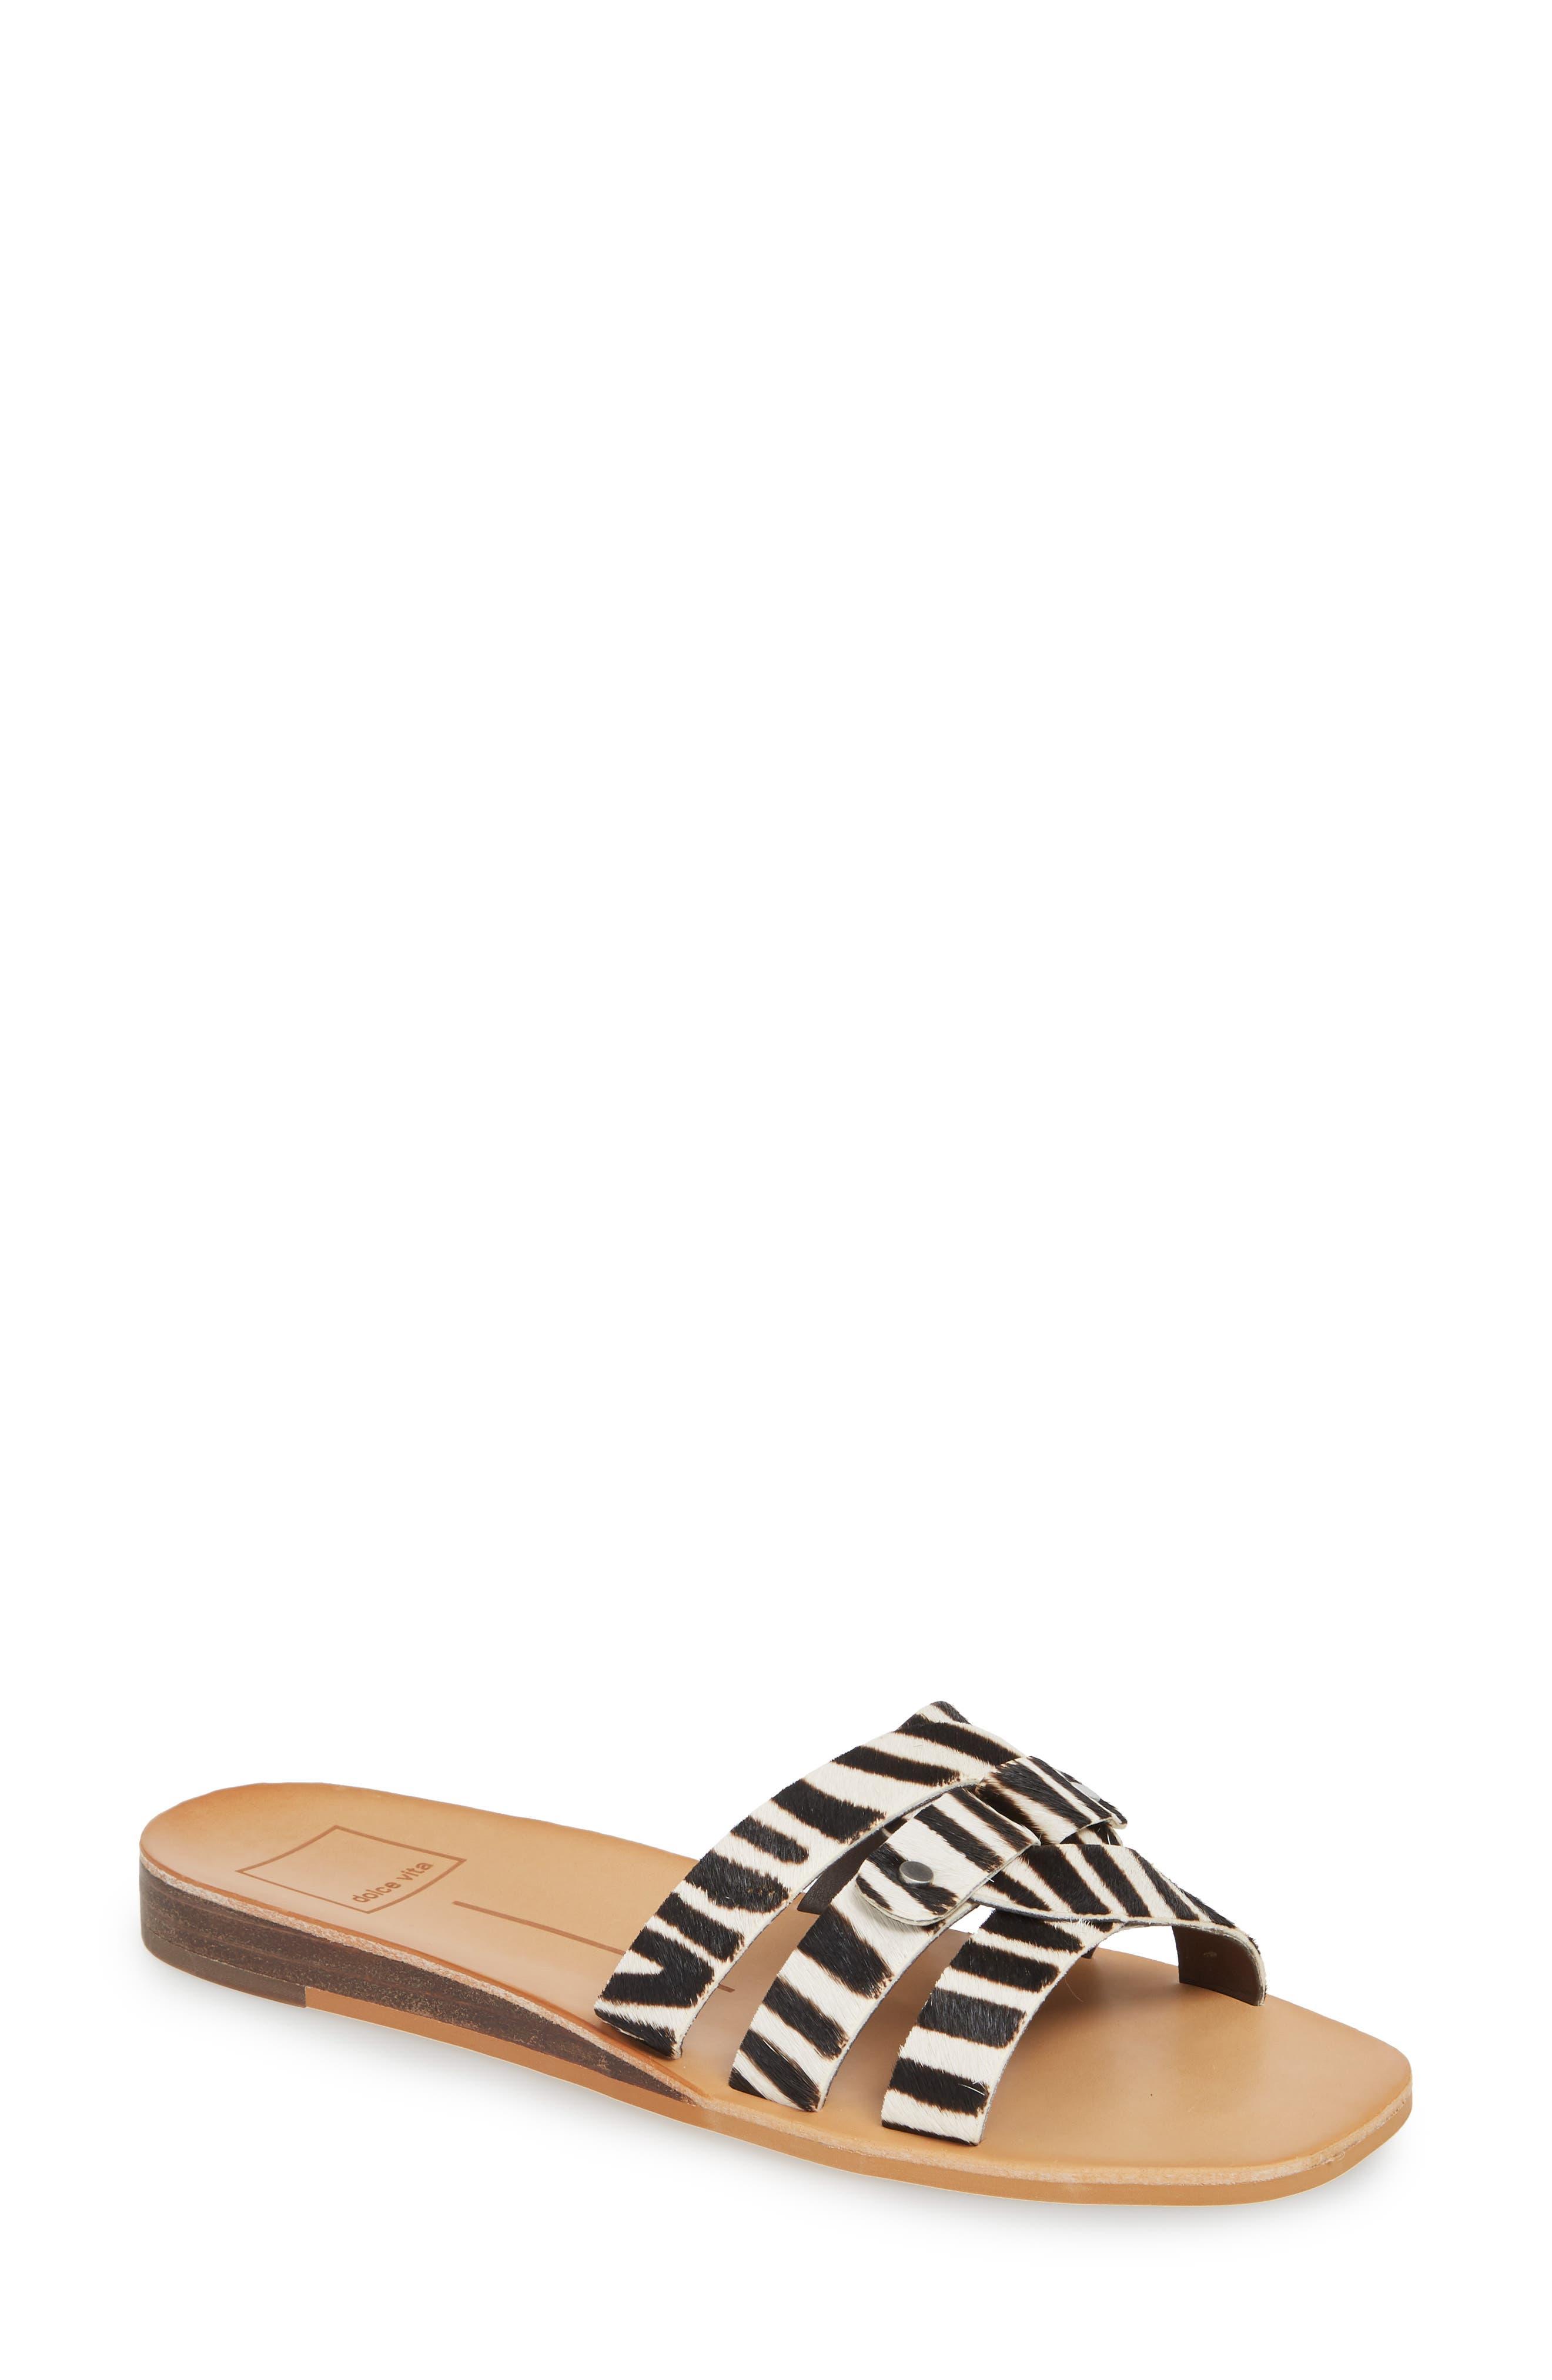 DOLCE VITA Cait Genuine Calf Hair Slide Sandal, Main, color, ZEBRA PRINT